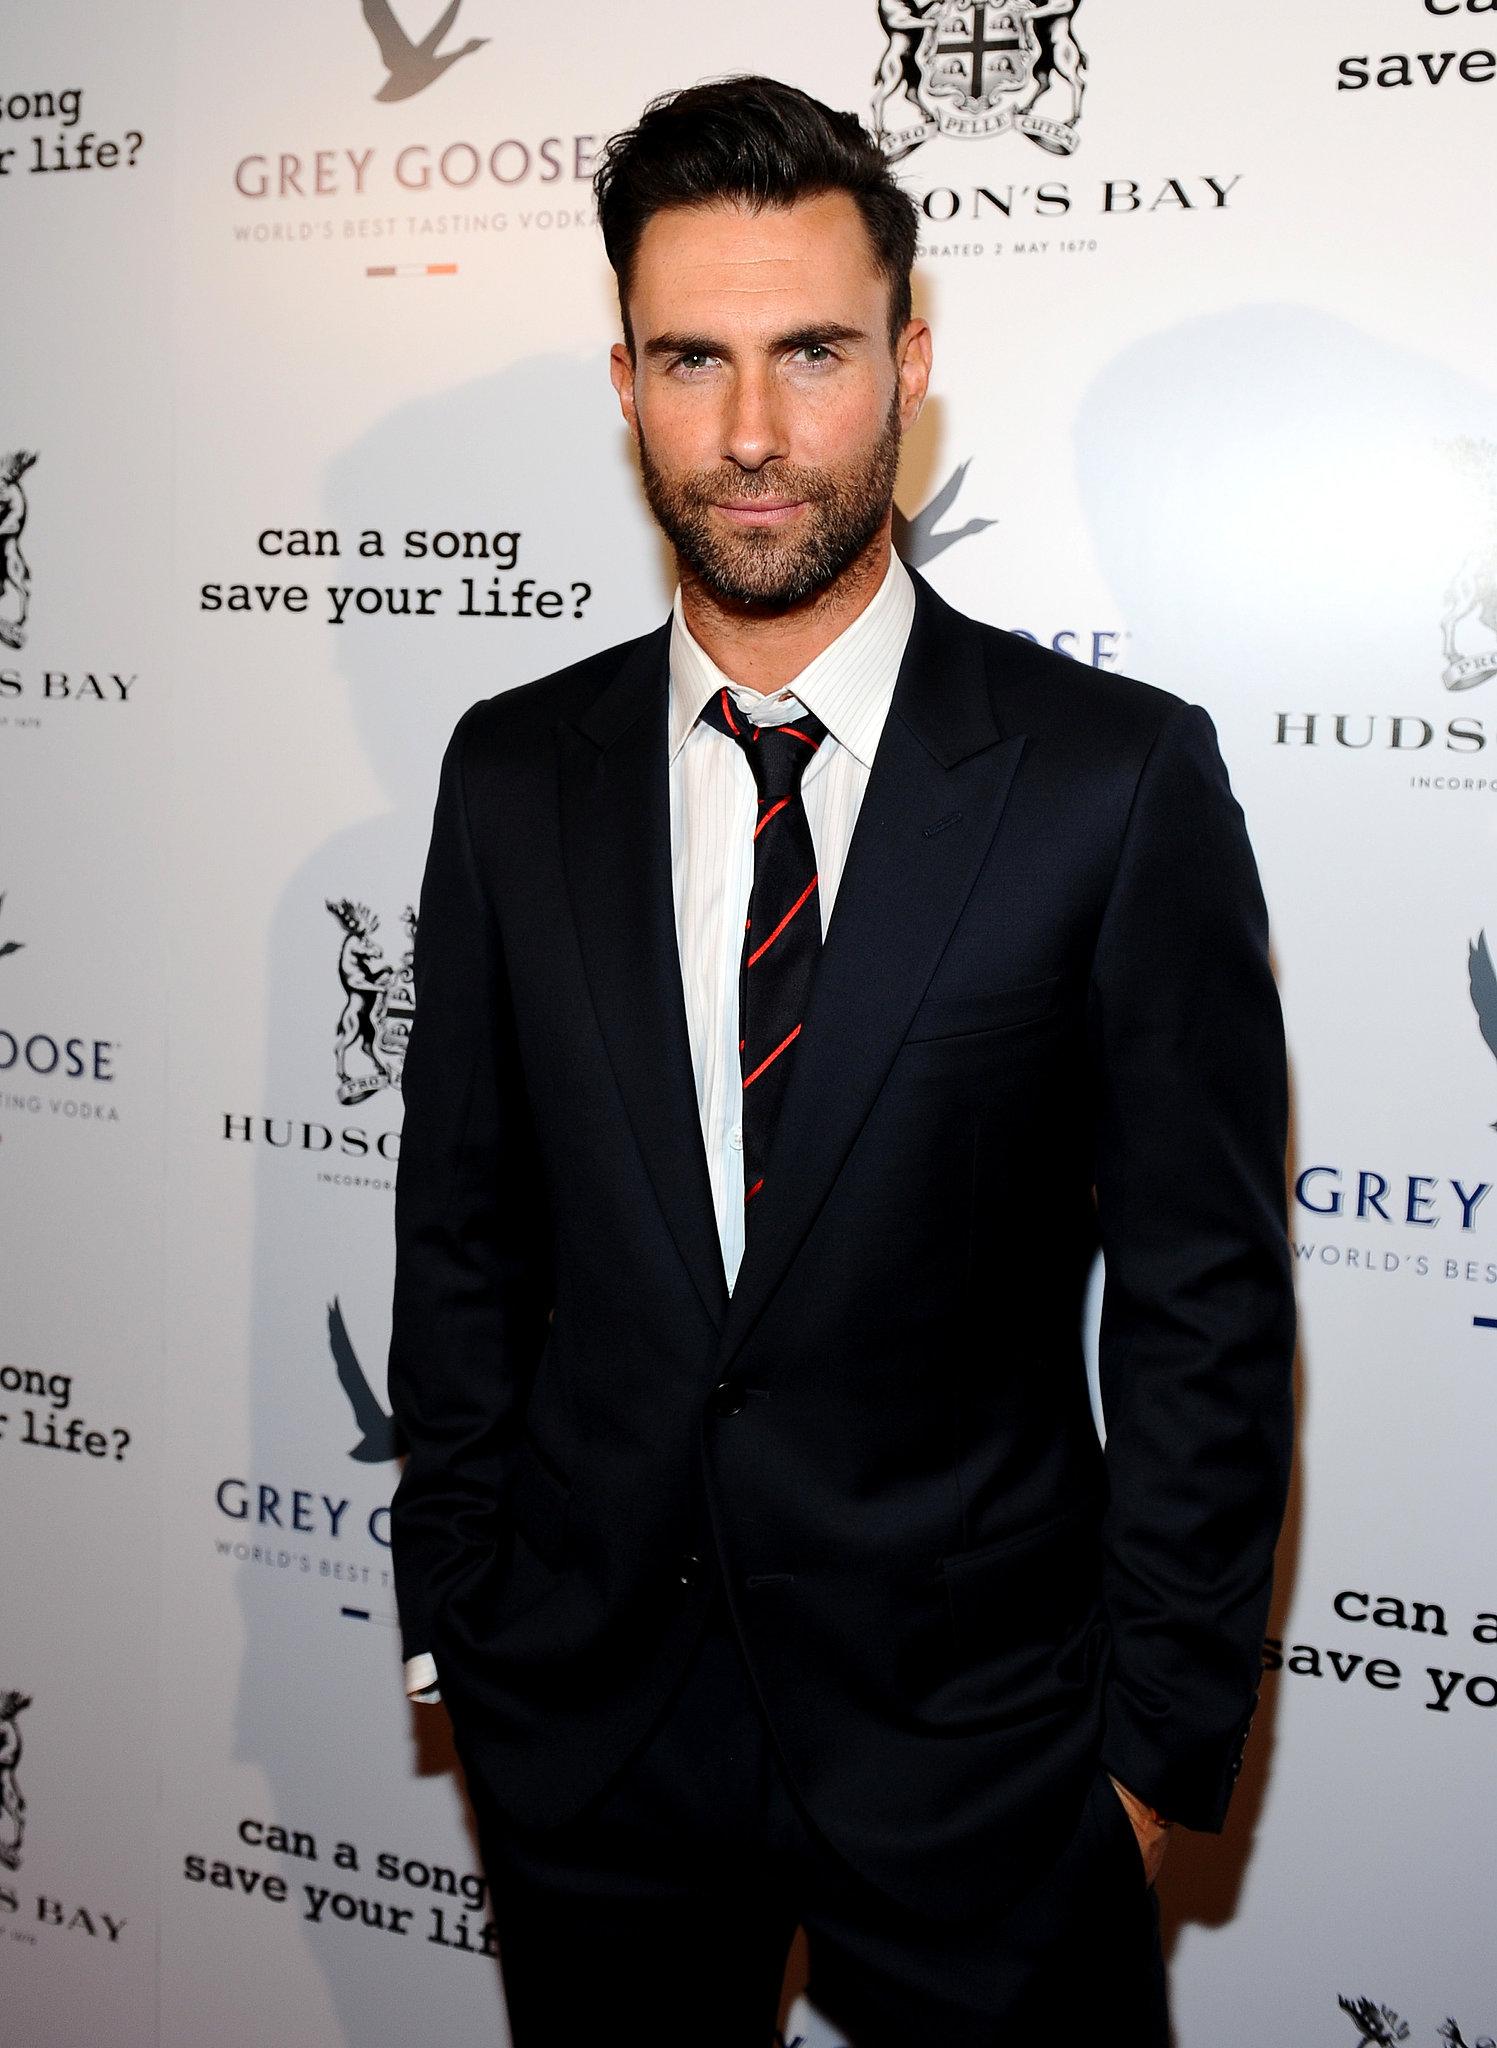 Adam Levine is People magazine's Sexiest Man of 2013.